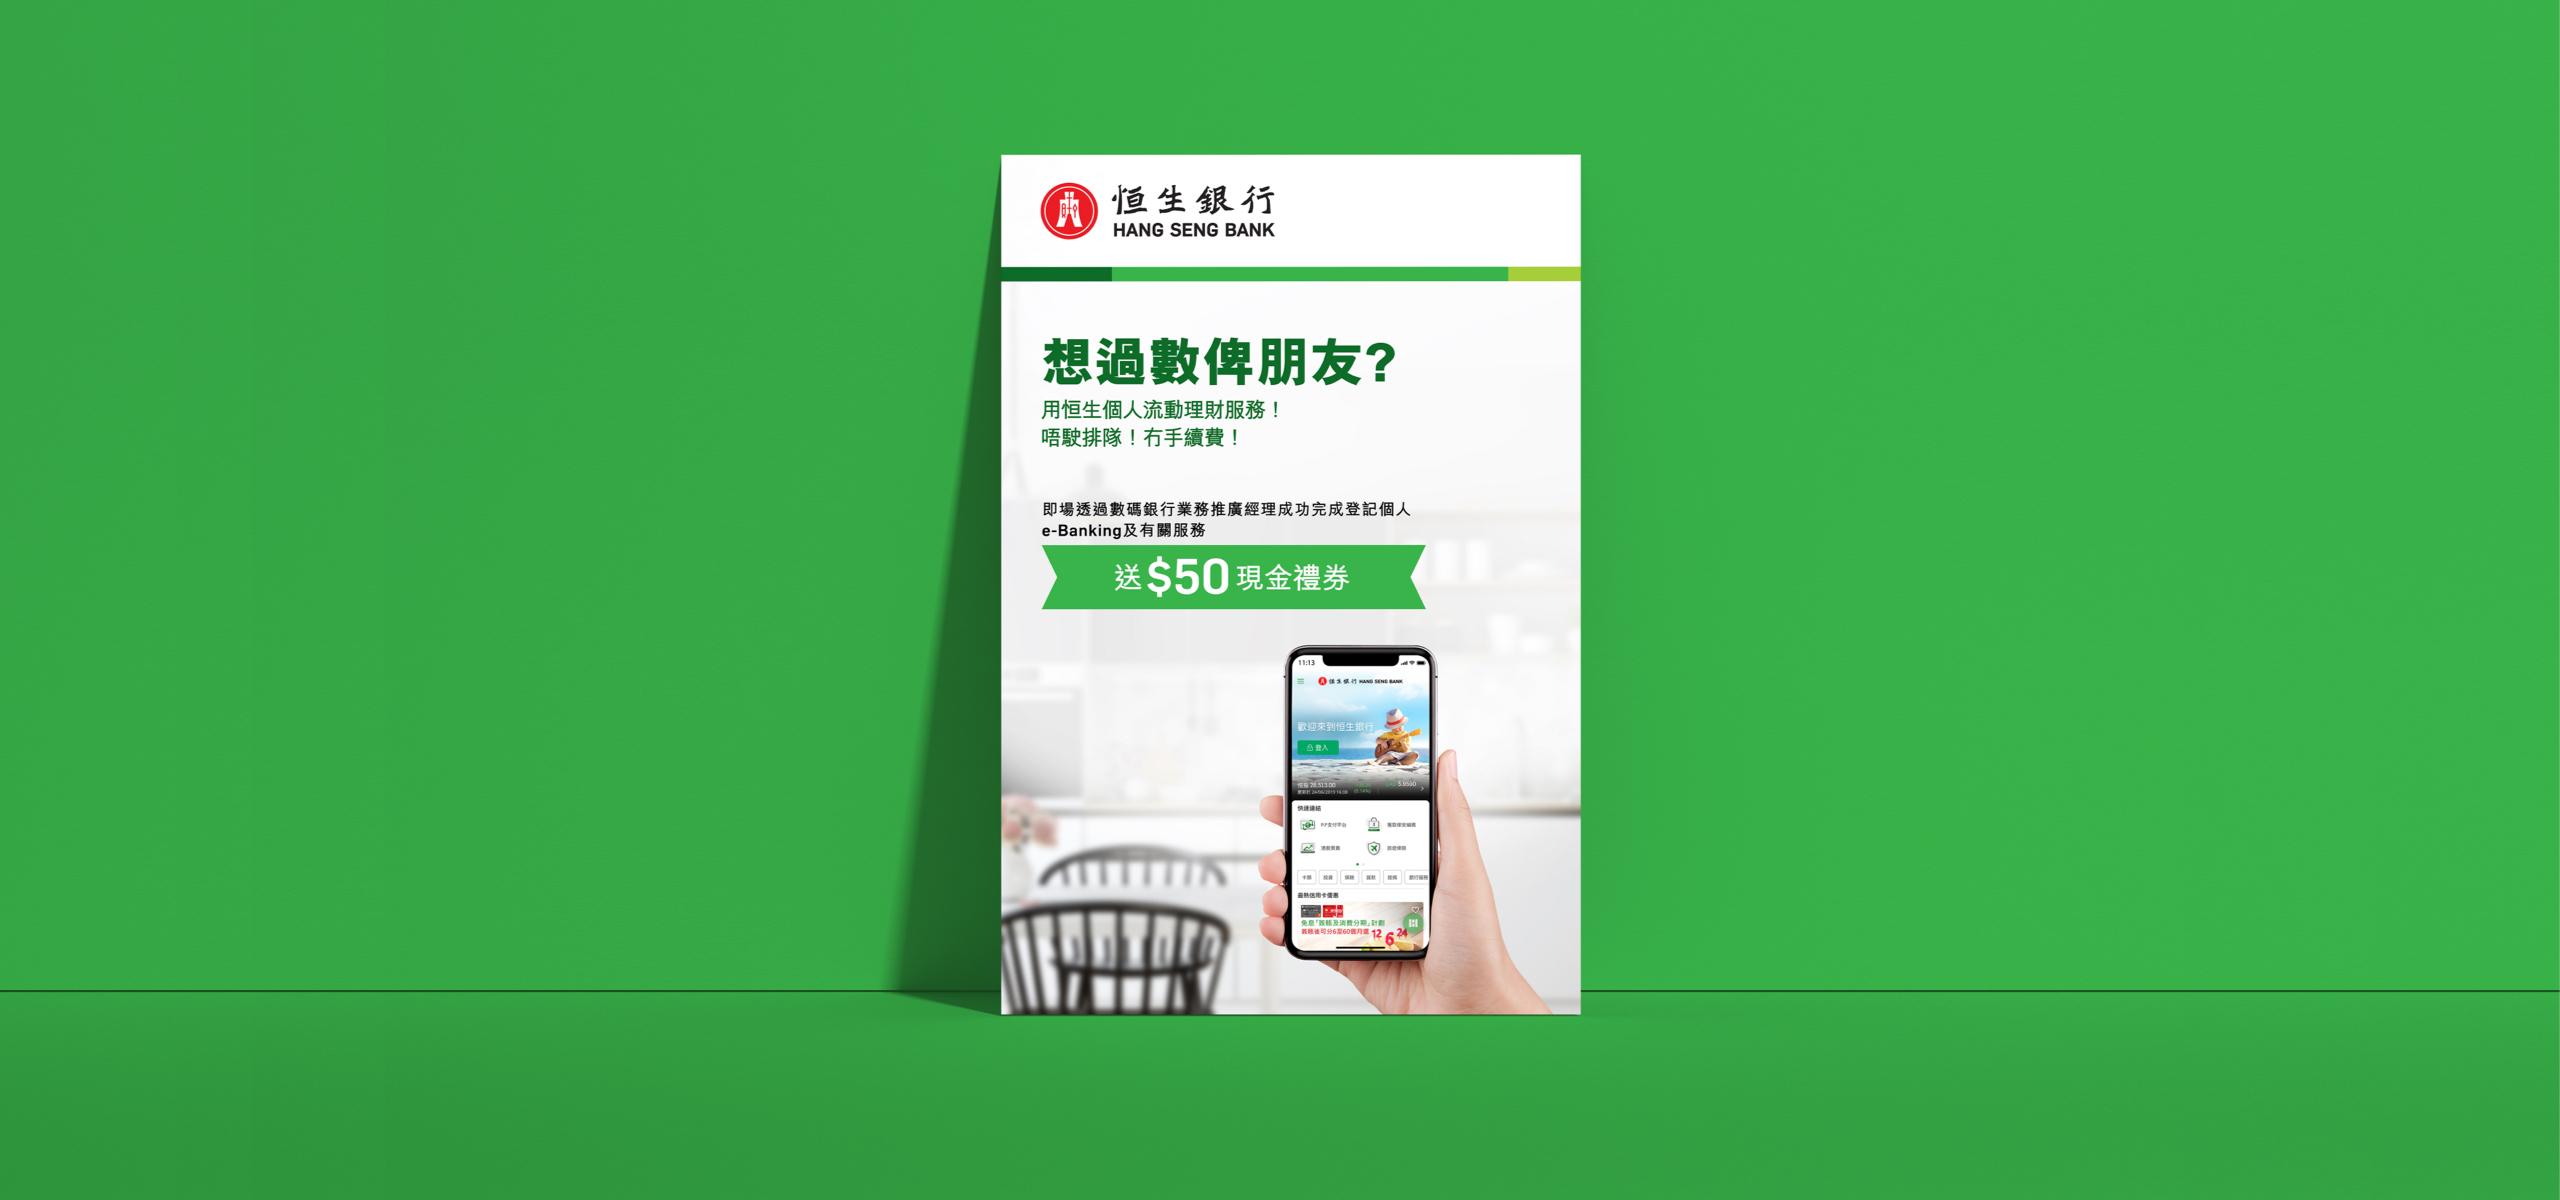 Hang Seng training and user platform